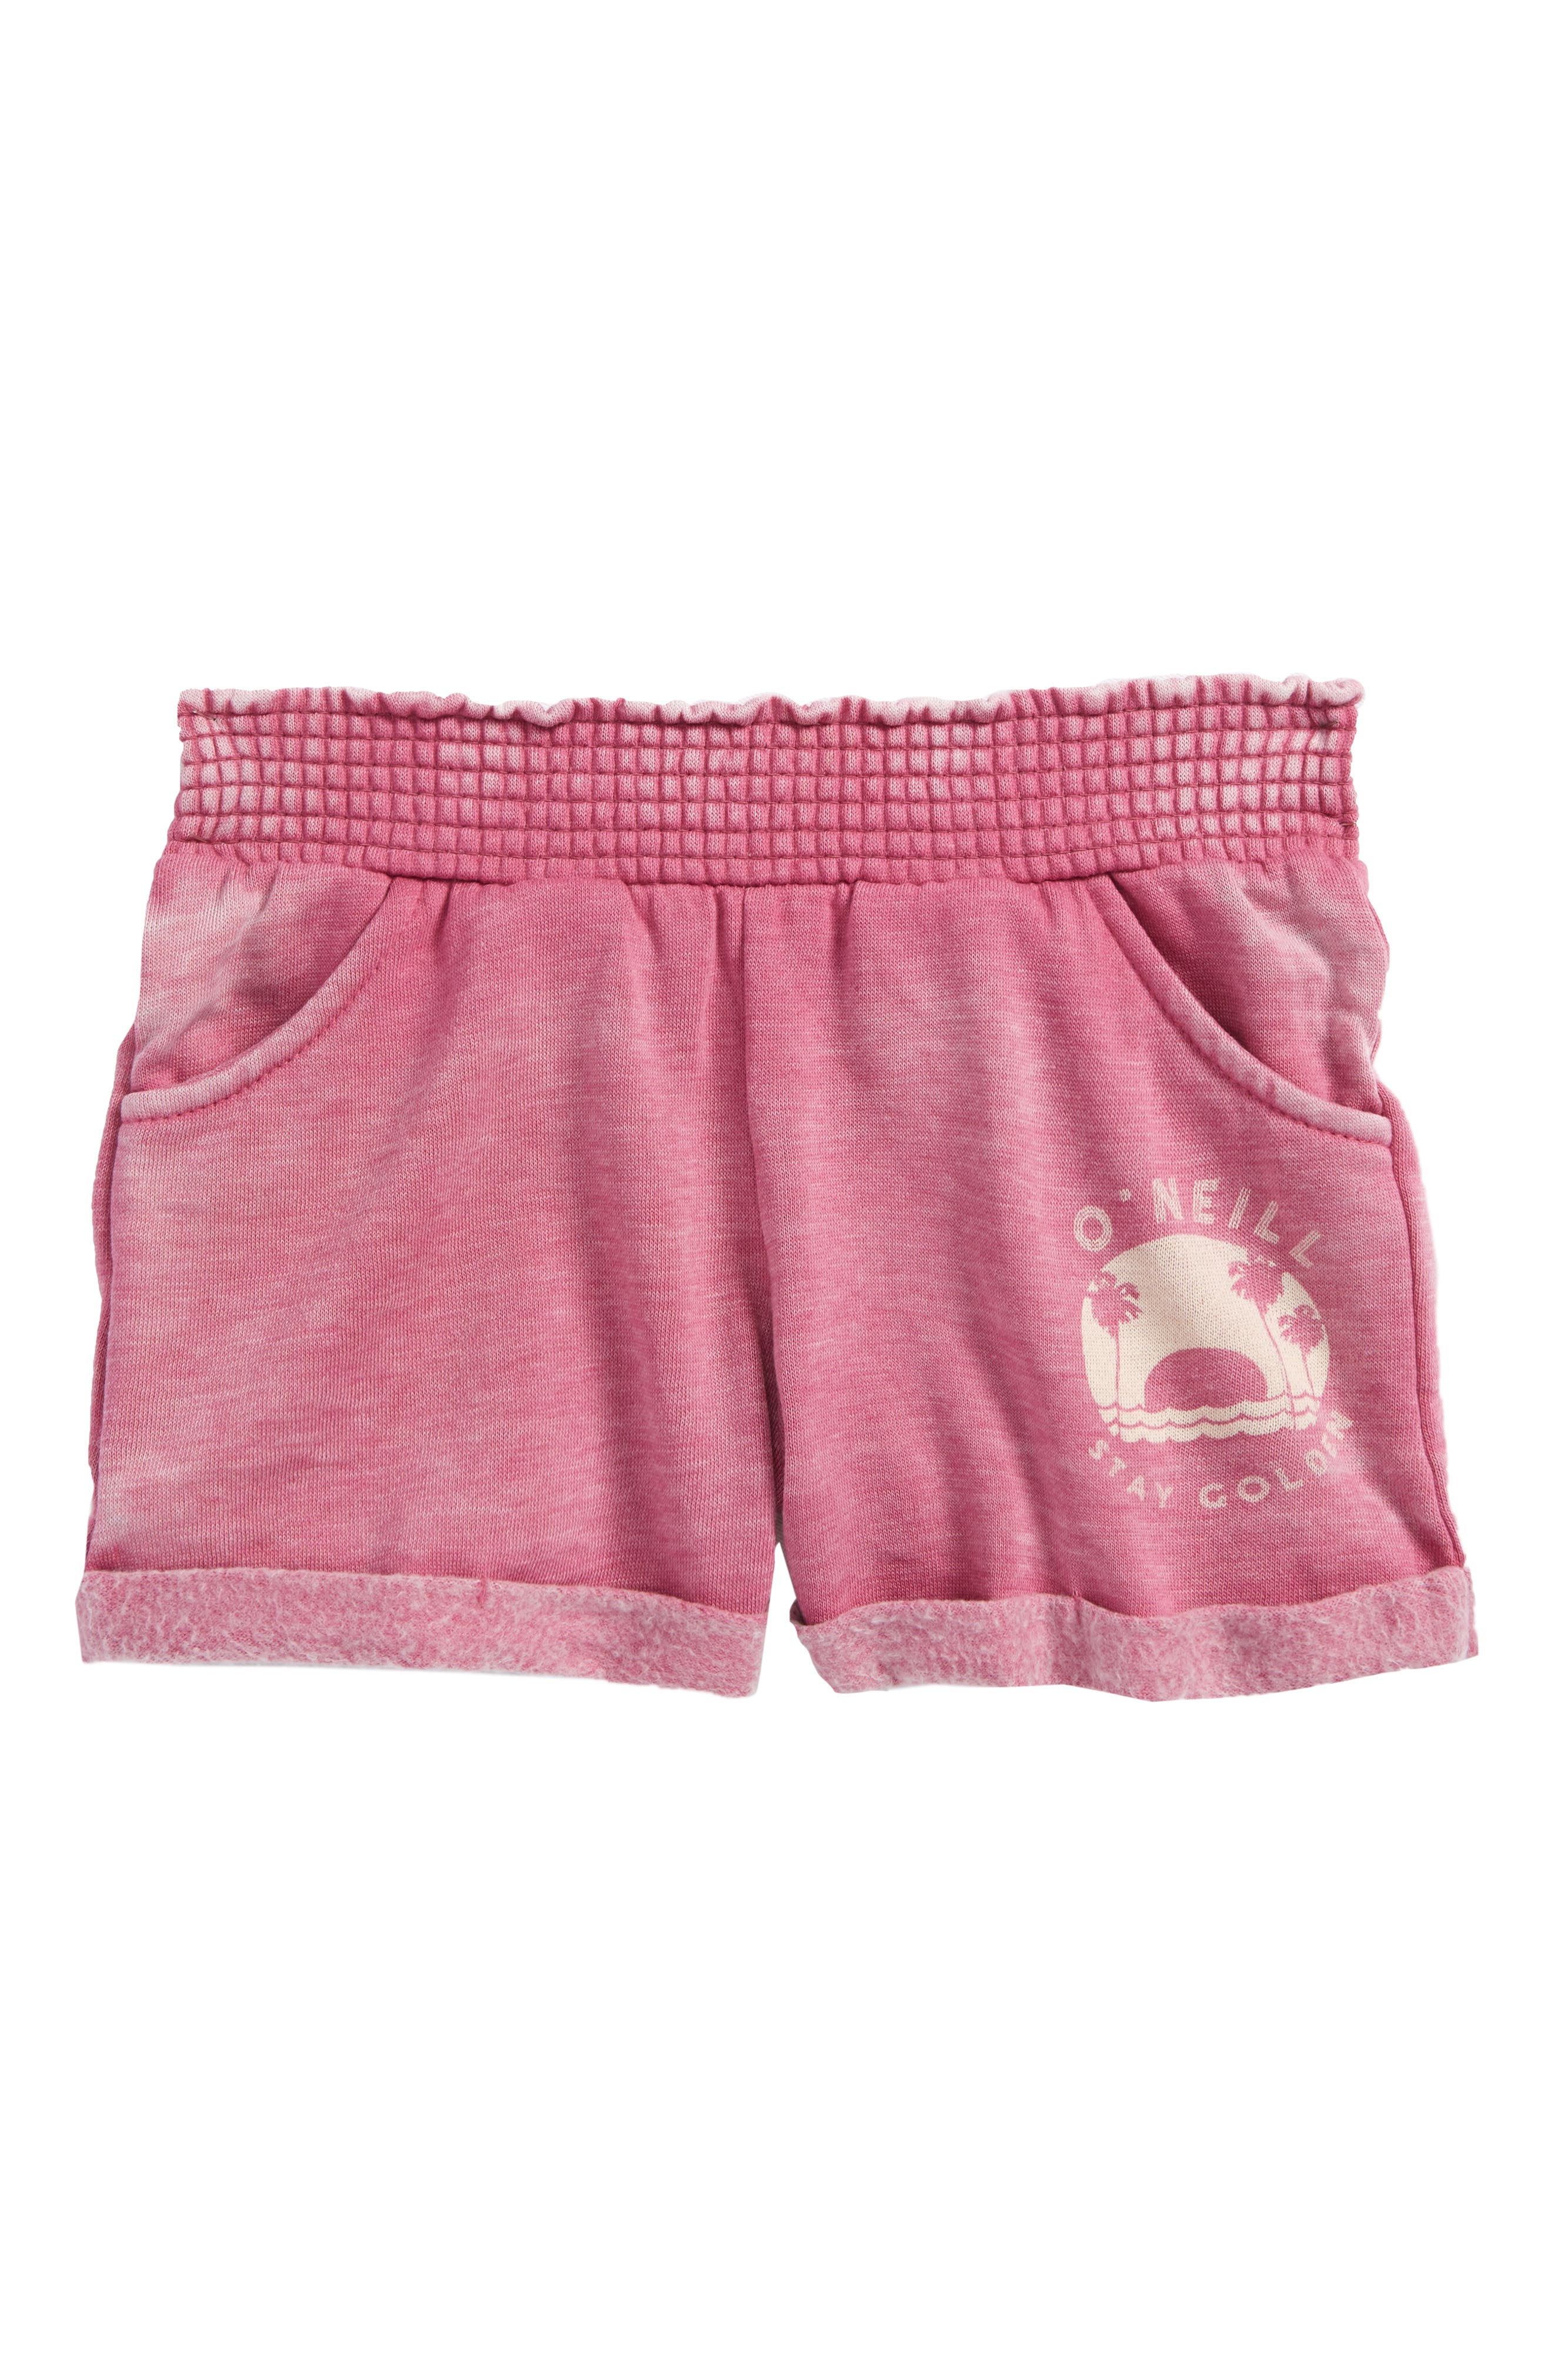 Horizon Shorts,                             Main thumbnail 1, color,                             WILD FLOWER